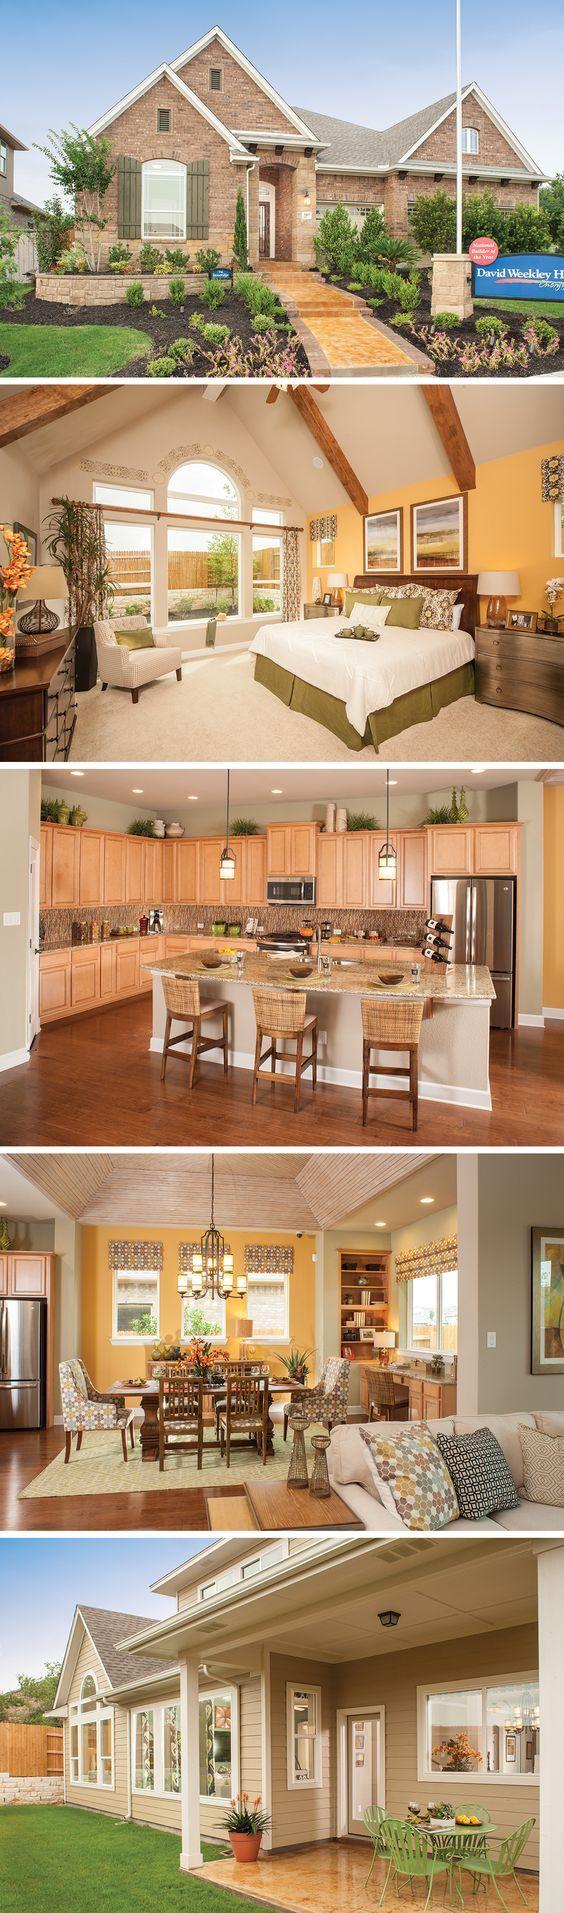 The best images about kitchen ideas on pinterest car garage